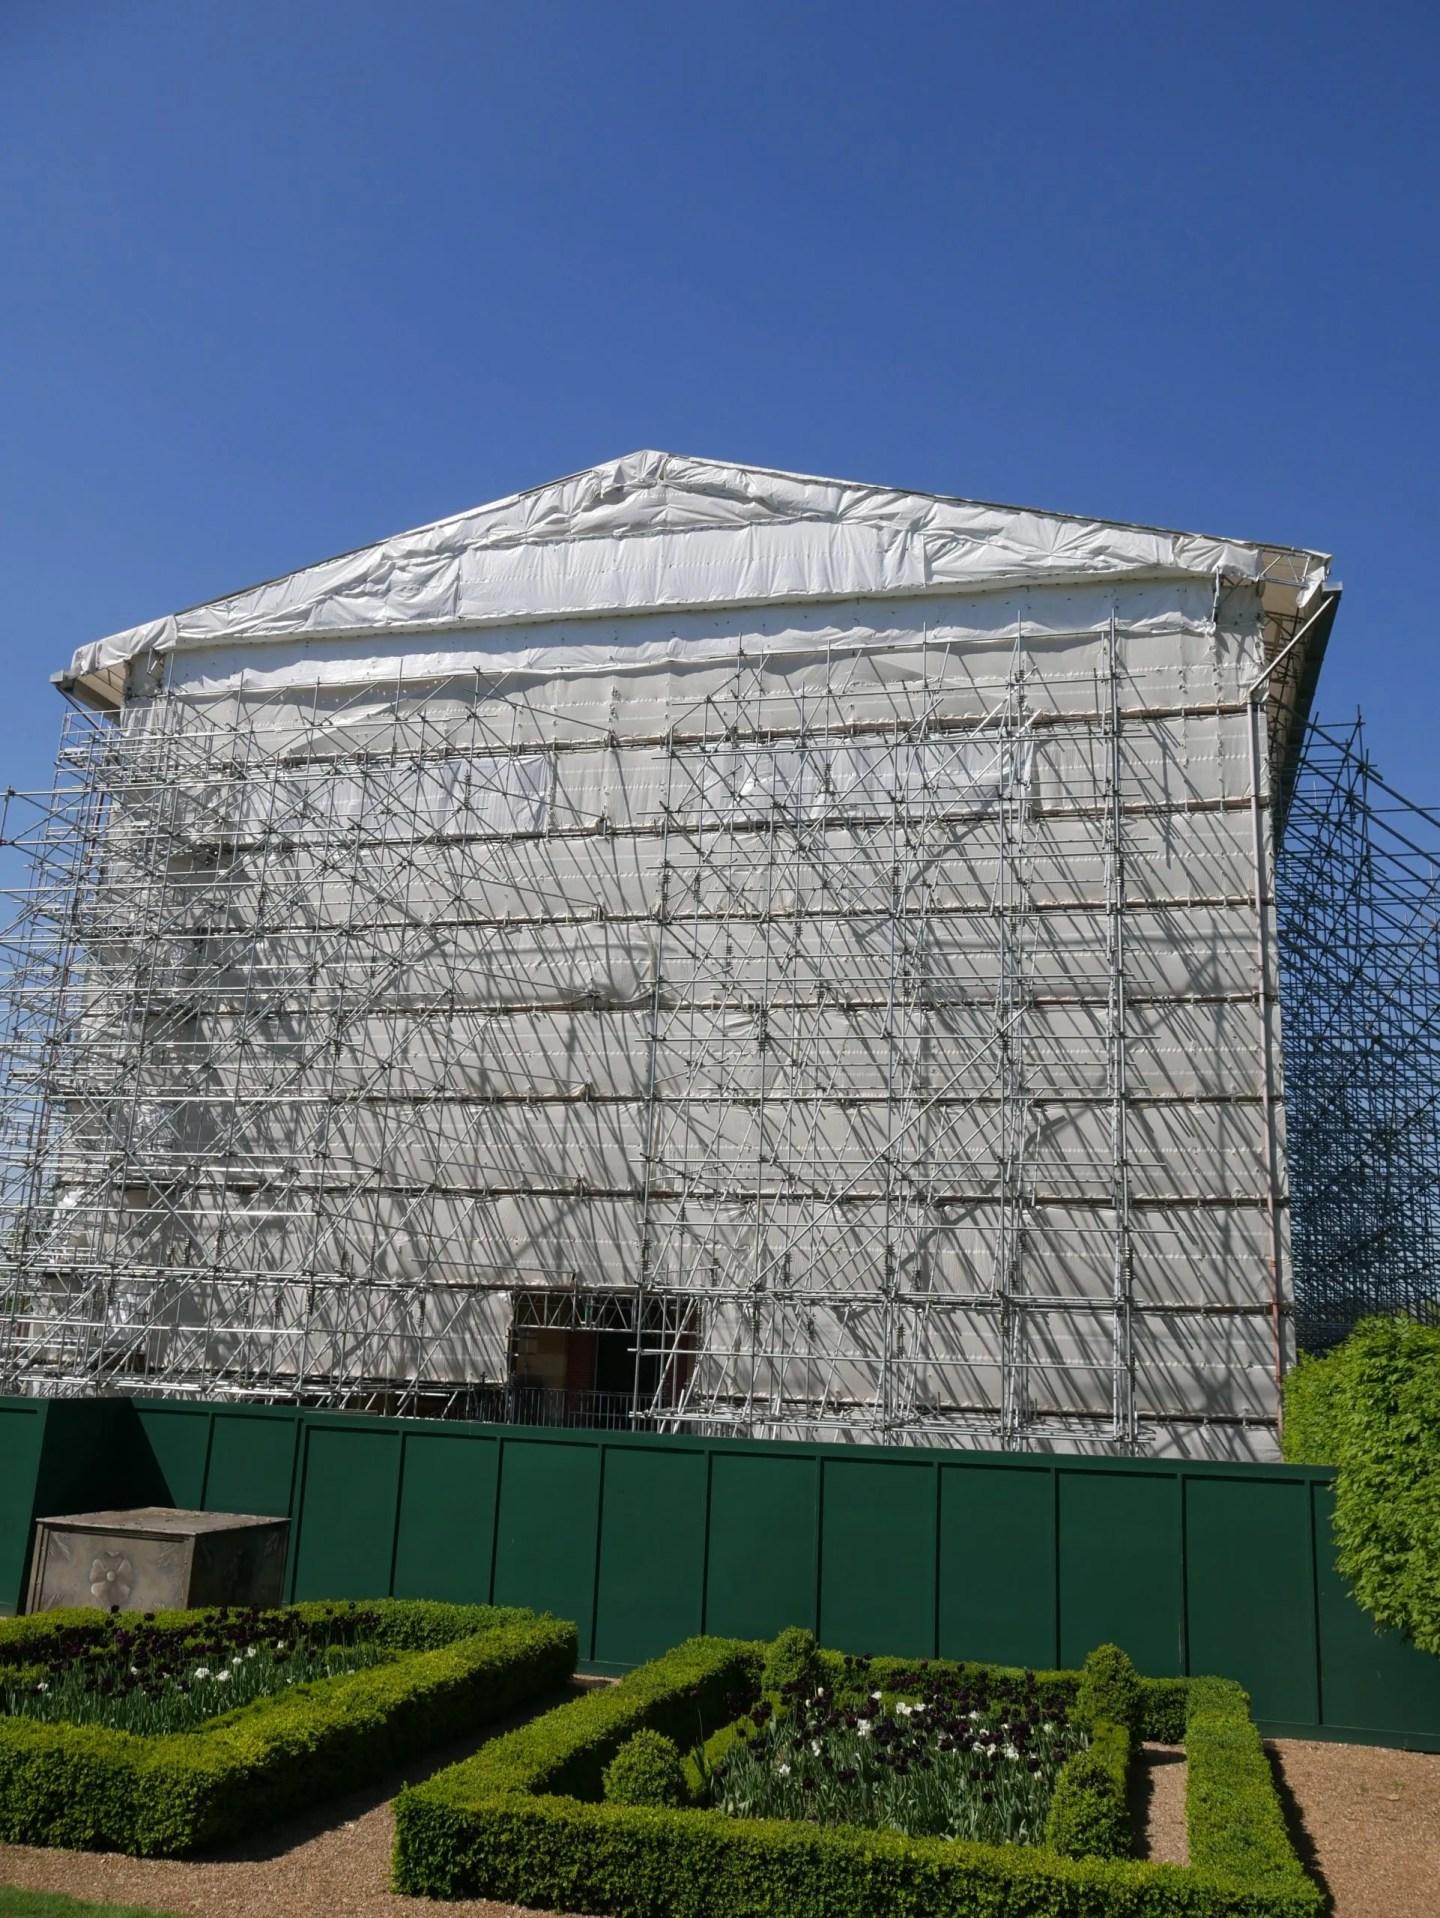 Clandon Park scaffolding